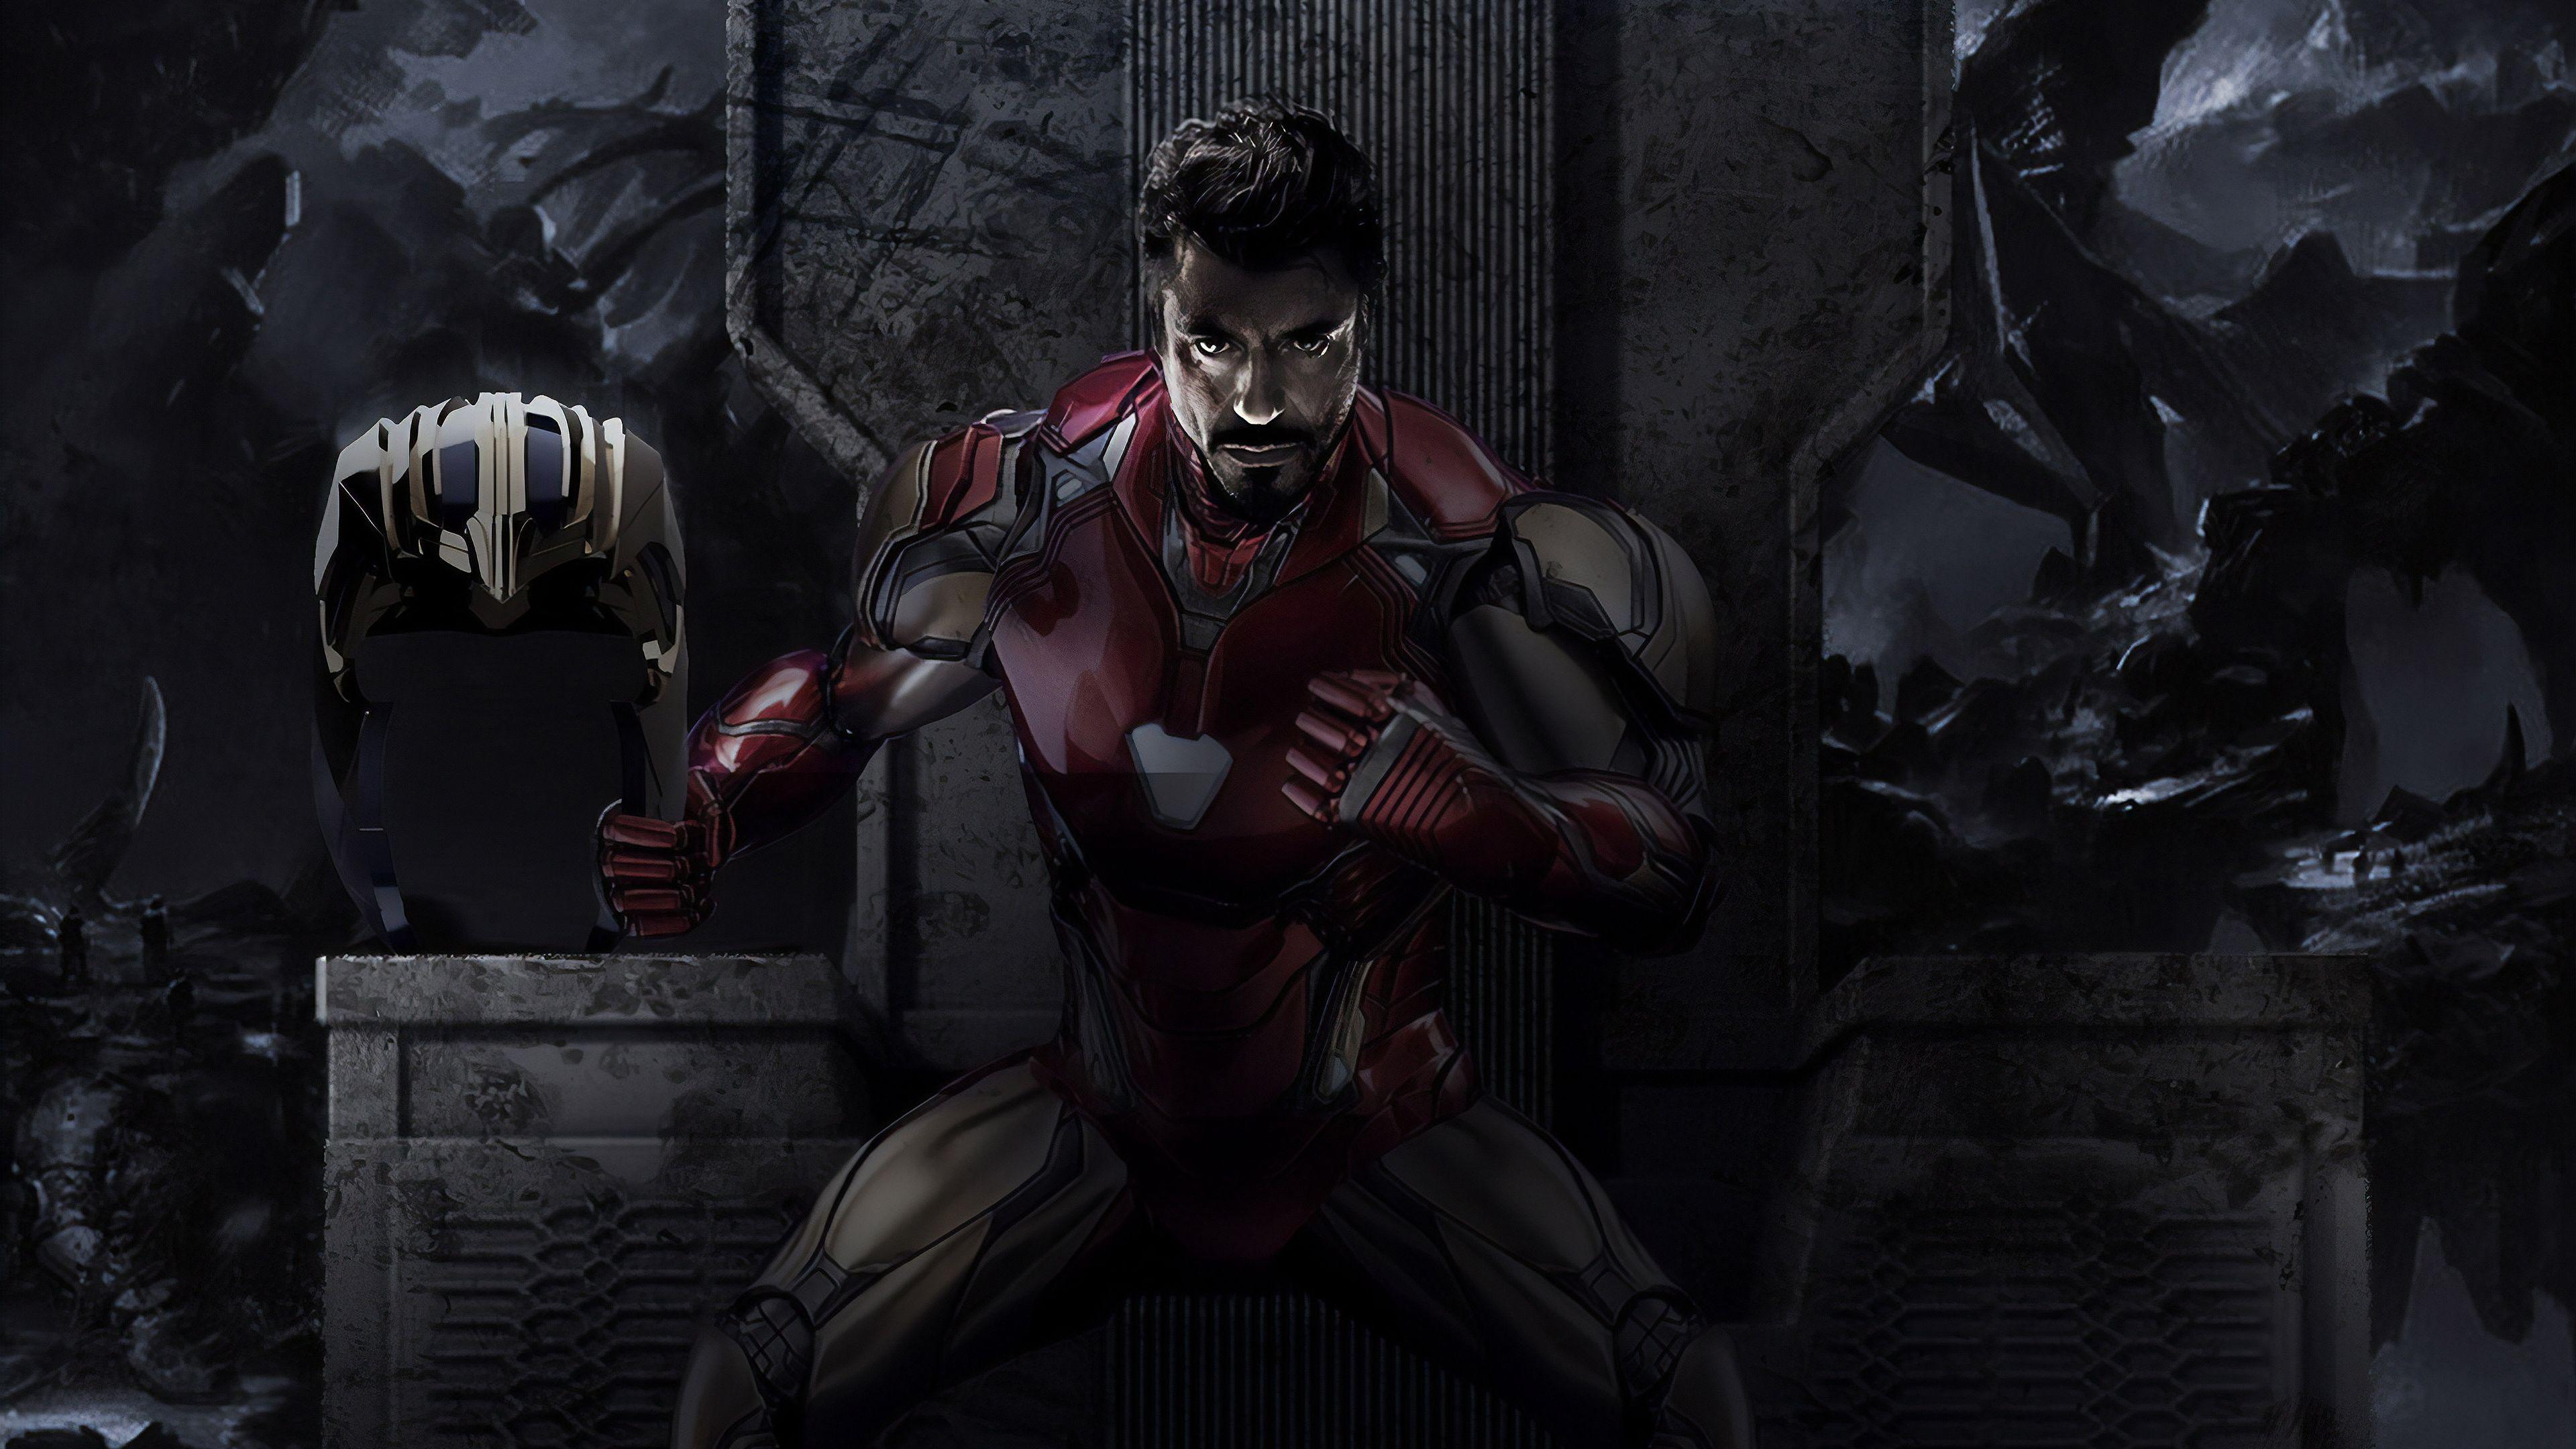 Iron Man Endgame 4k Superheroes Wallpapers Iron Man Wallpapers Hd Wallpapers Digital Art Wa Iron Man Wallpapers Avengers Endgame Iron Man Iron Man Wallpaper